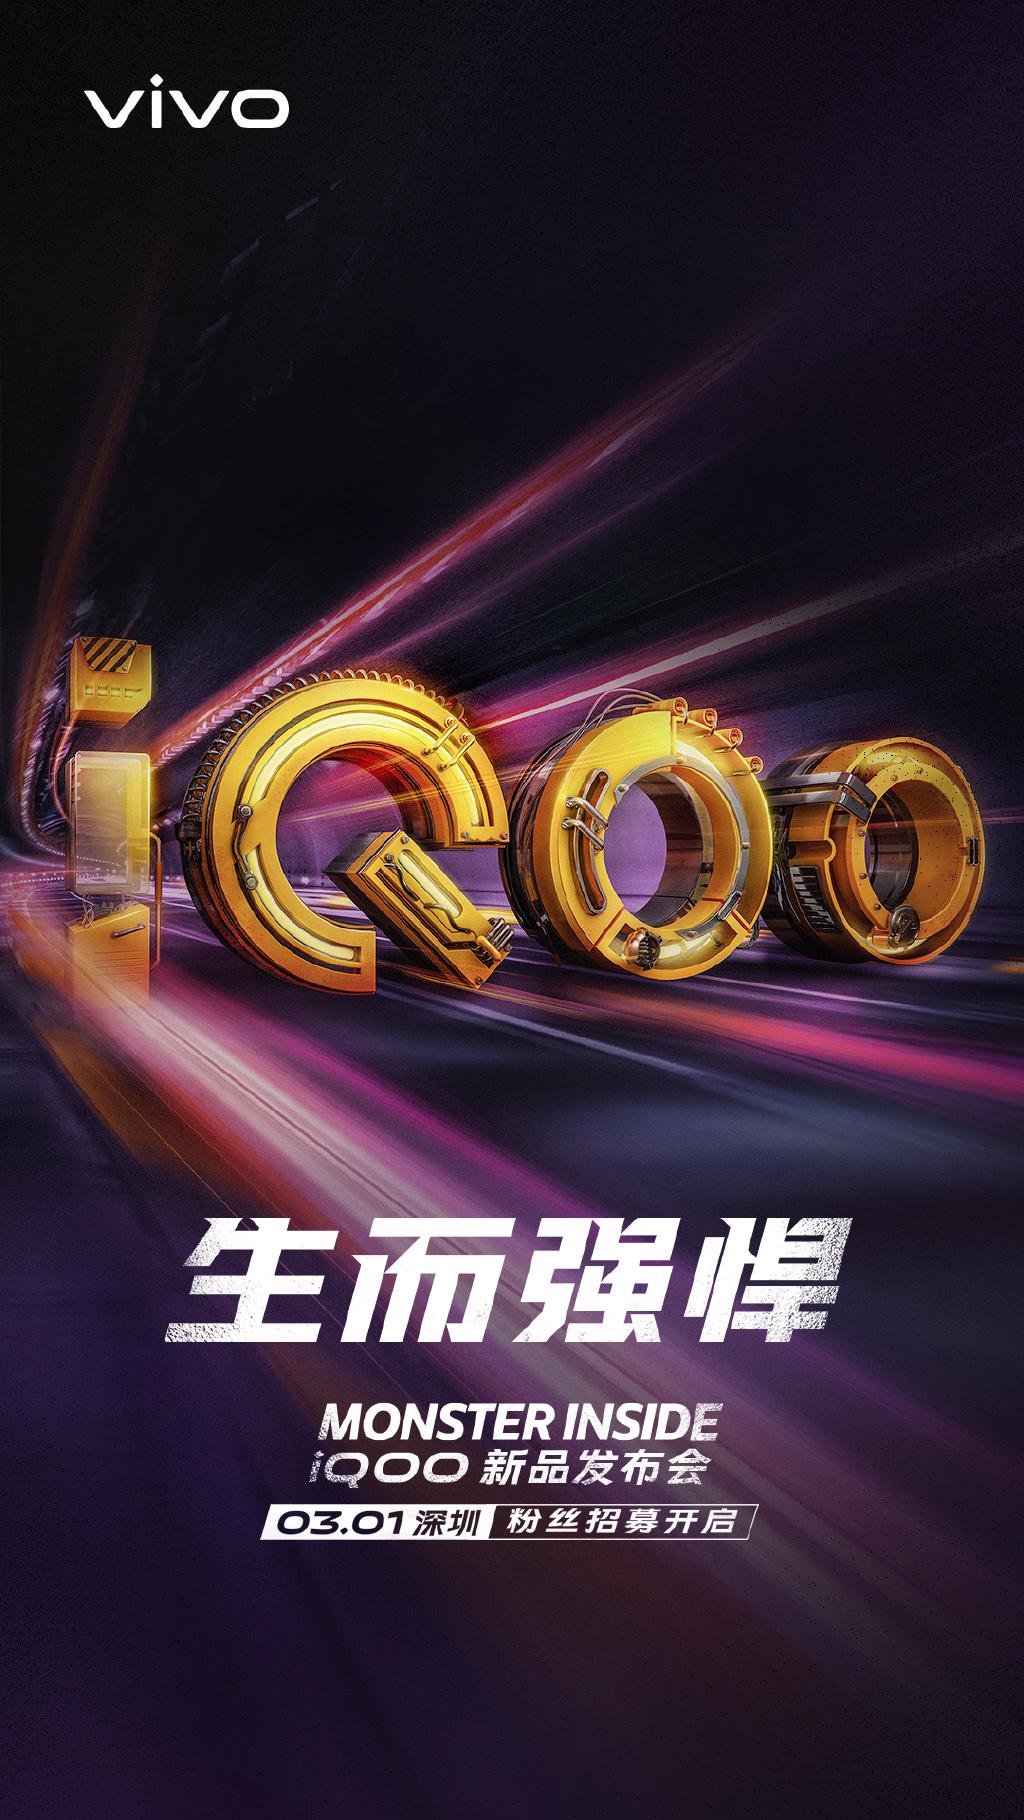 vivo子品牌iQOO定位确认:极致性能